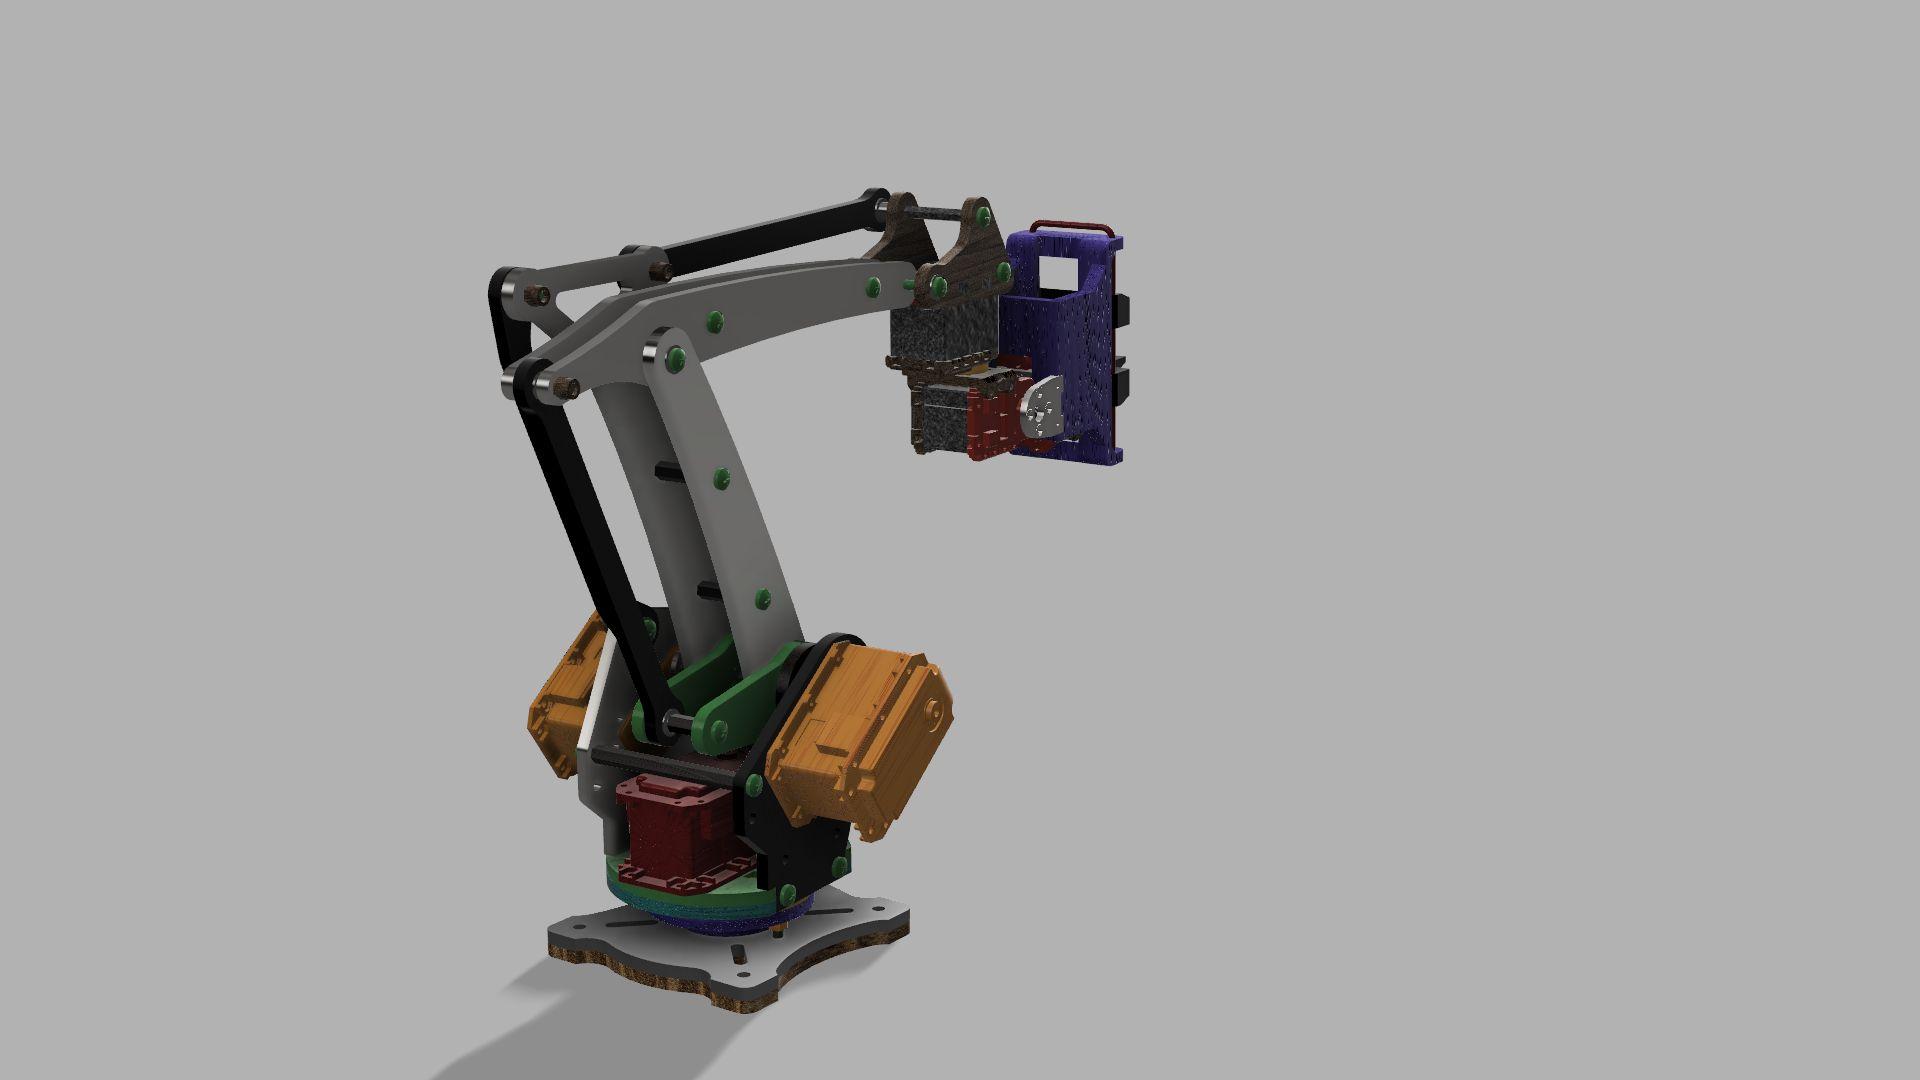 Robotic-crane-03-3500-3500